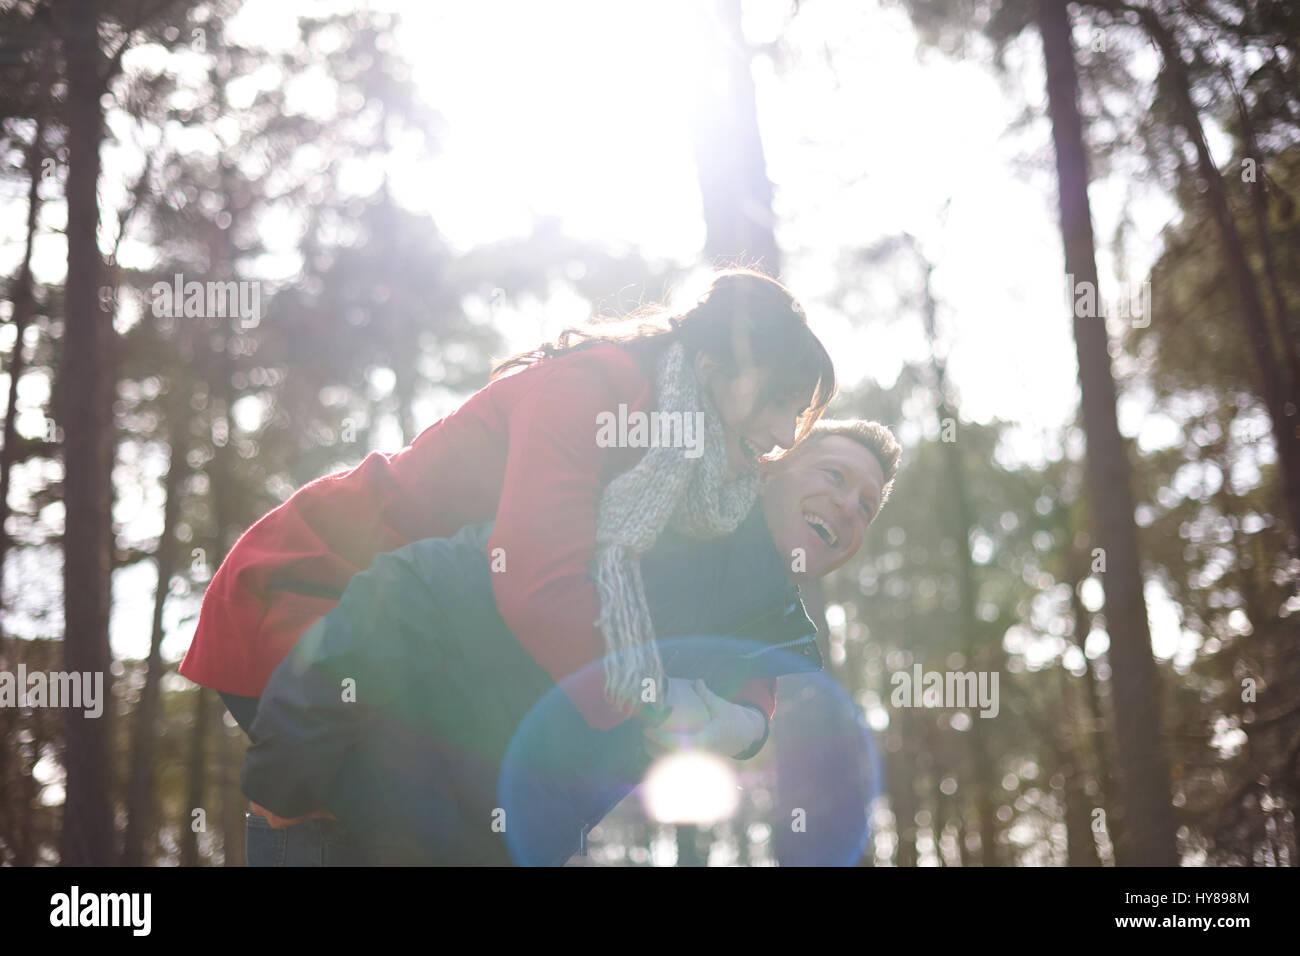 Un hombre le da a su pareja femenina un piggy back en un paseo en el bosque Imagen De Stock